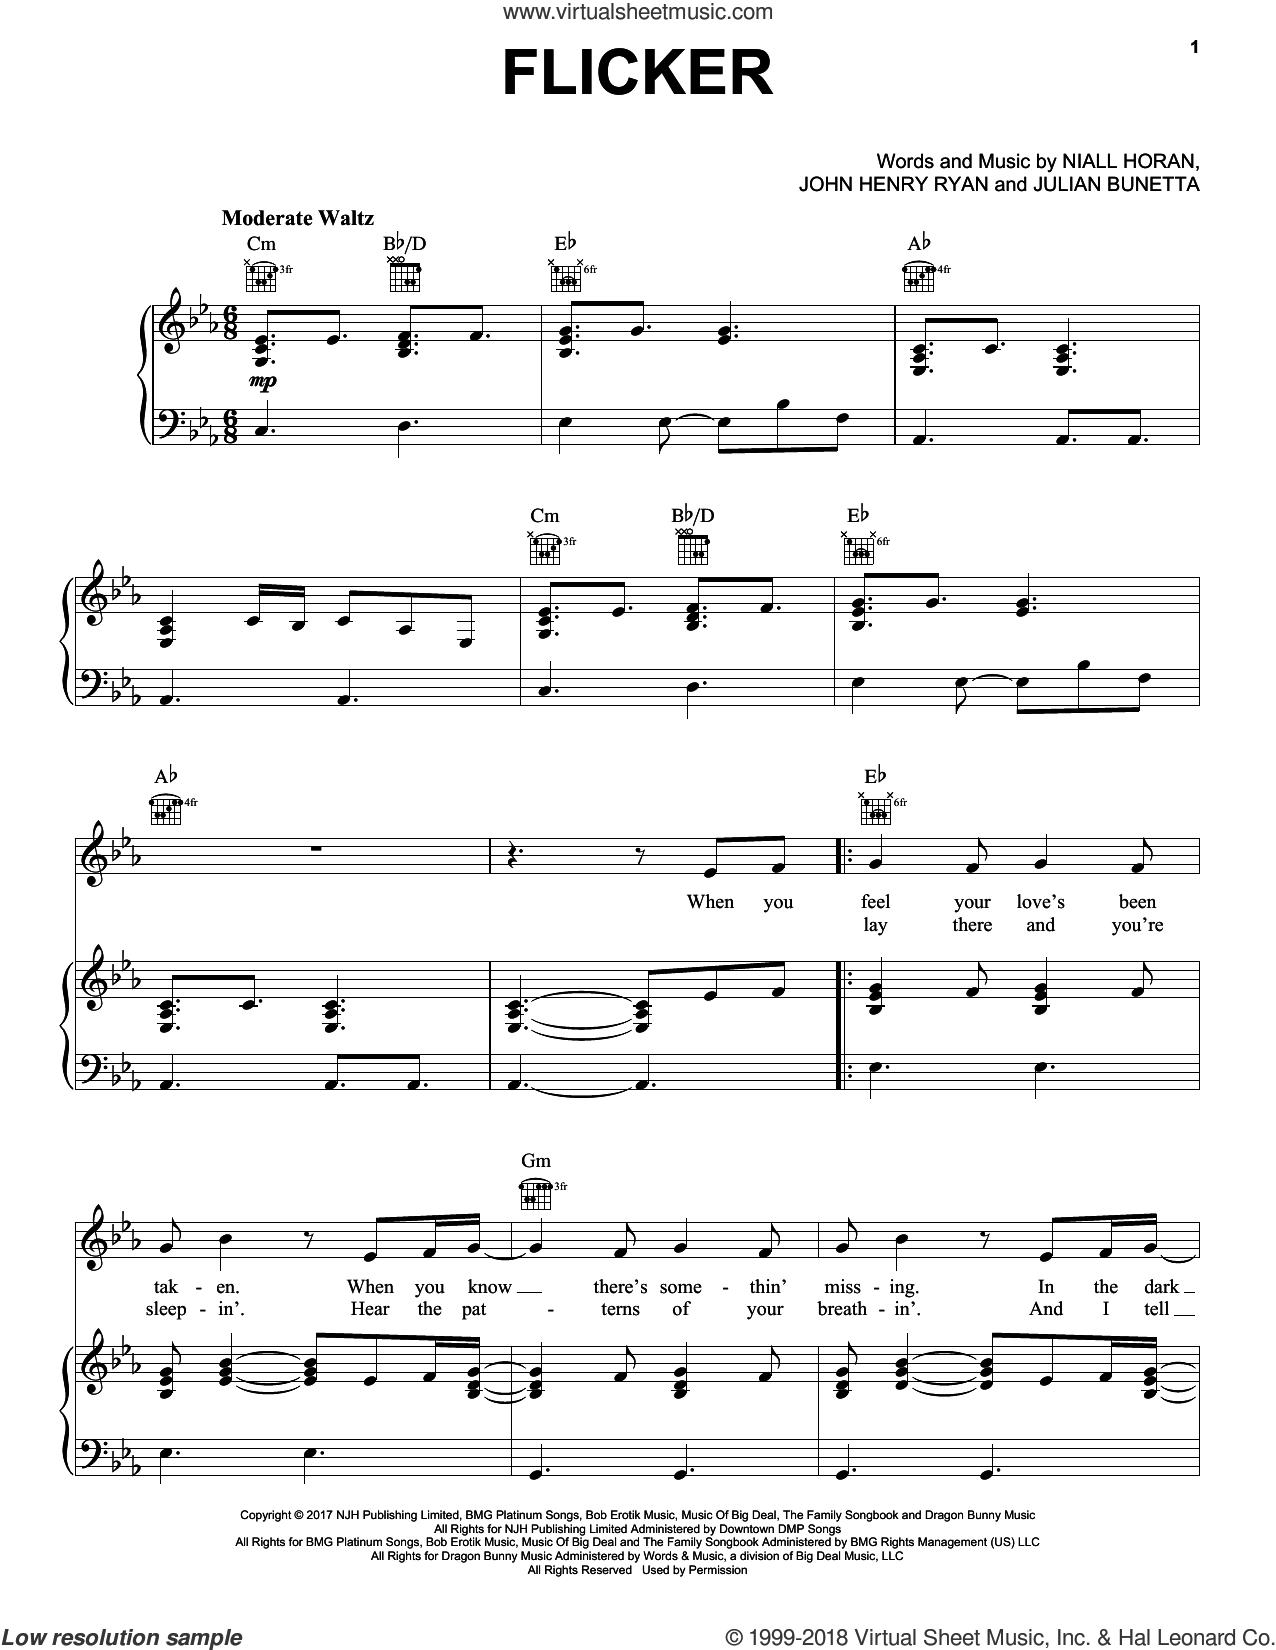 Flicker sheet music for voice, piano or guitar by Niall Horan, John Henry Ryan and Julian Bunetta, intermediate skill level